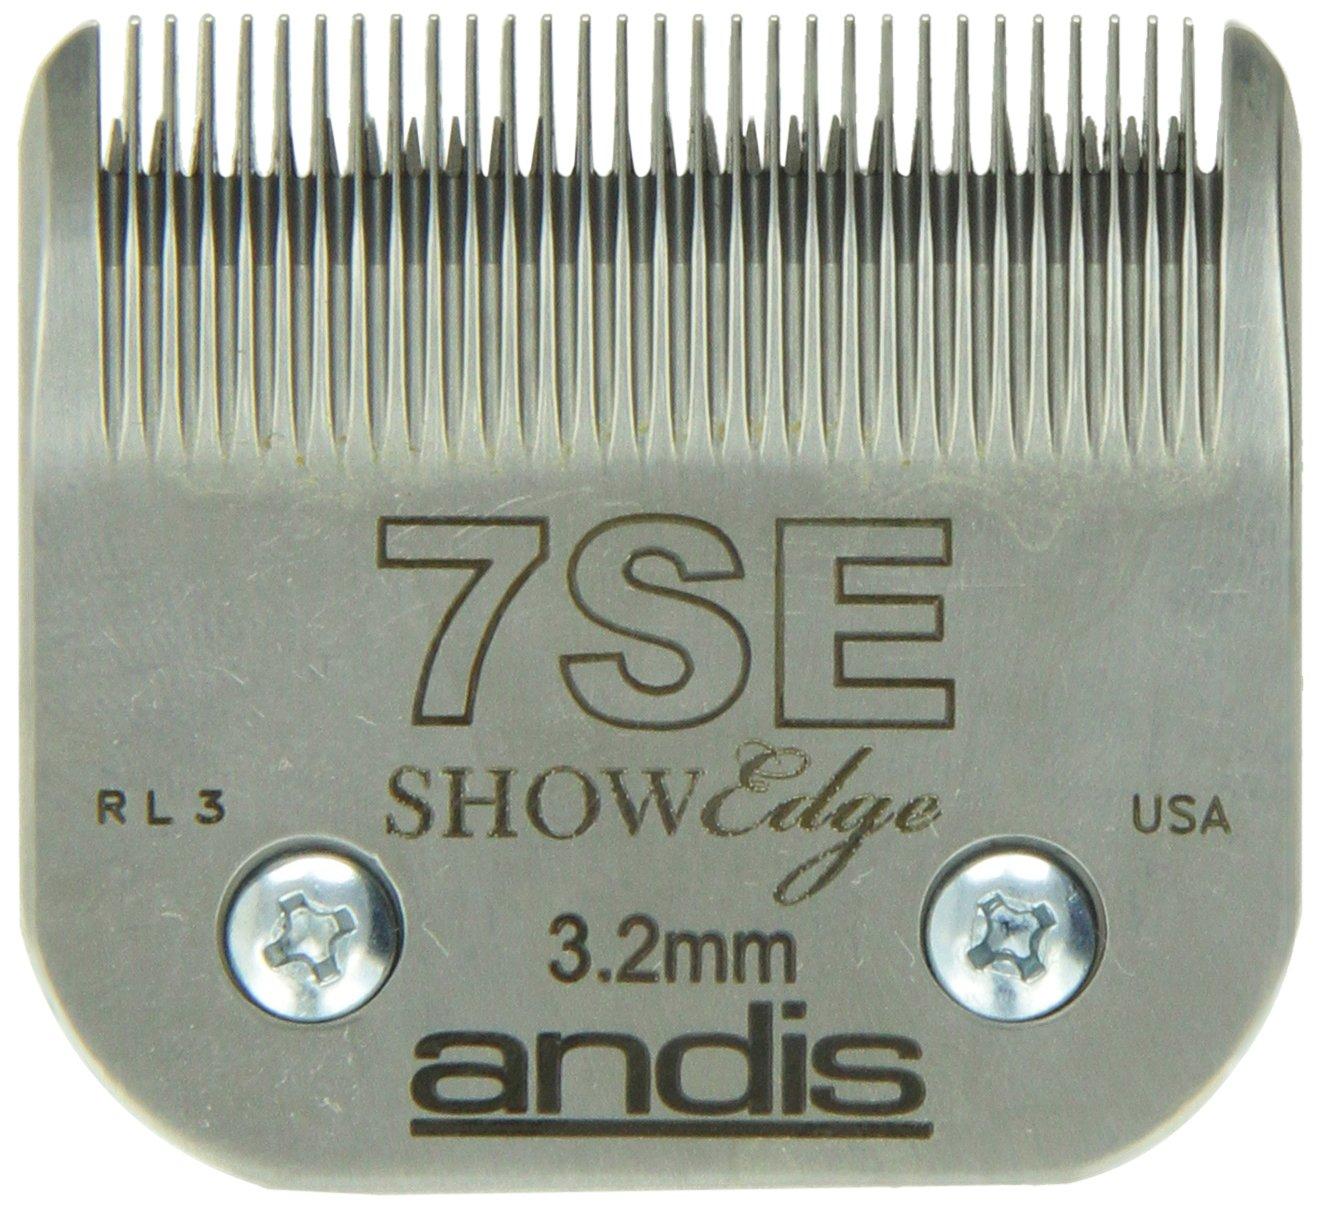 Andis Pet No.7SE Blade Set, 1/8-Inch, 3.2mm (65605)